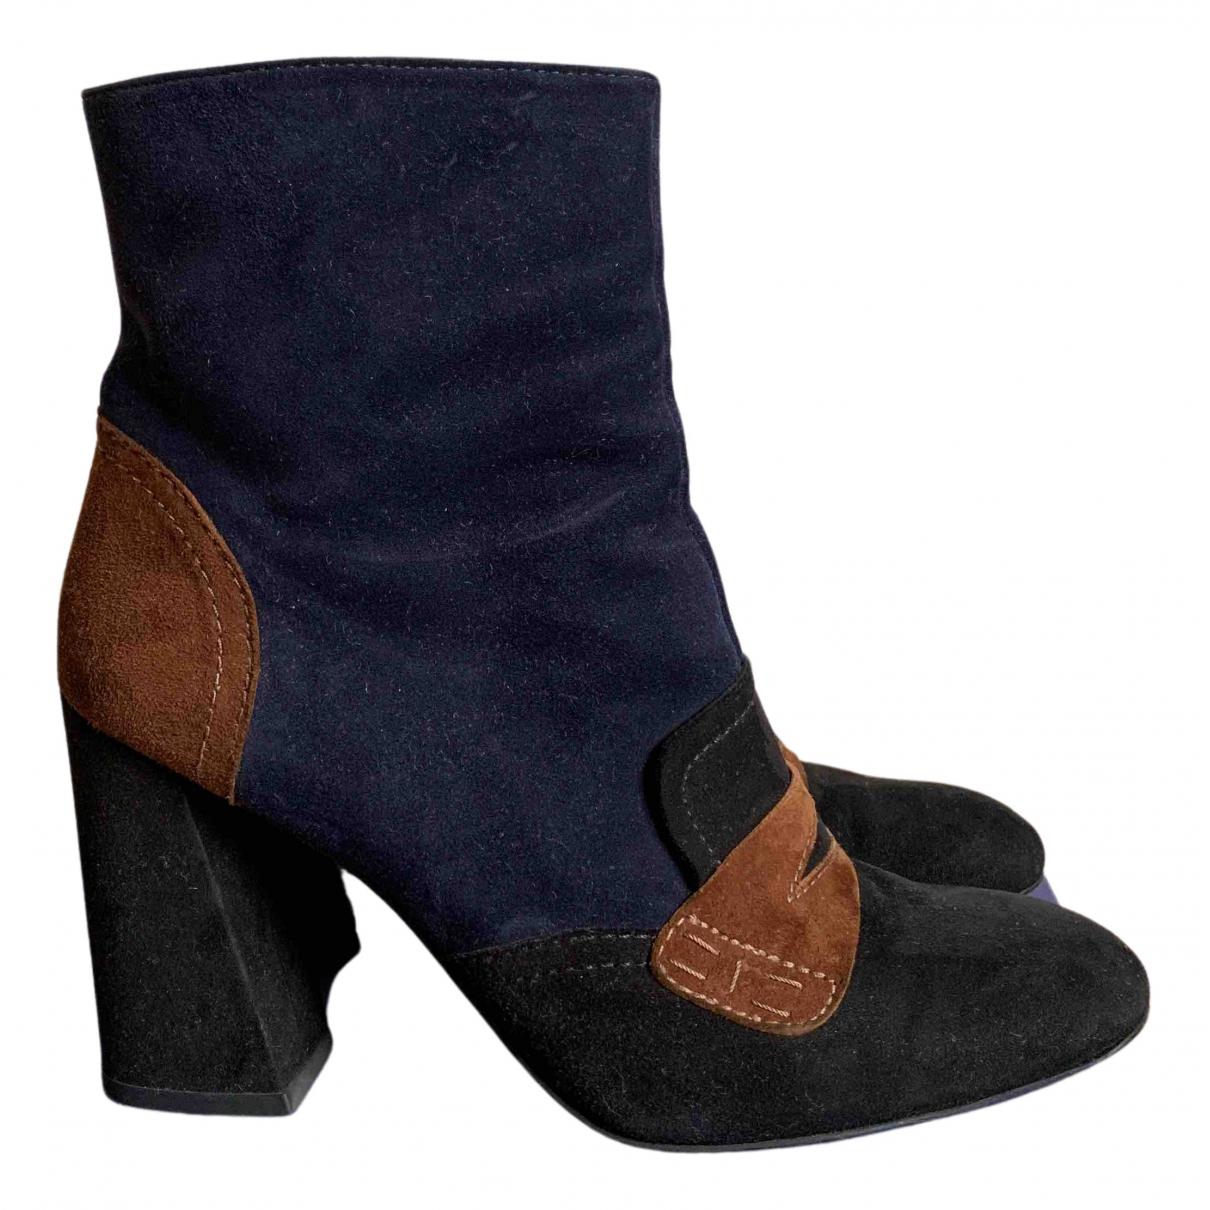 Stuart Weitzman N Suede Ankle boots for Women 41 EU